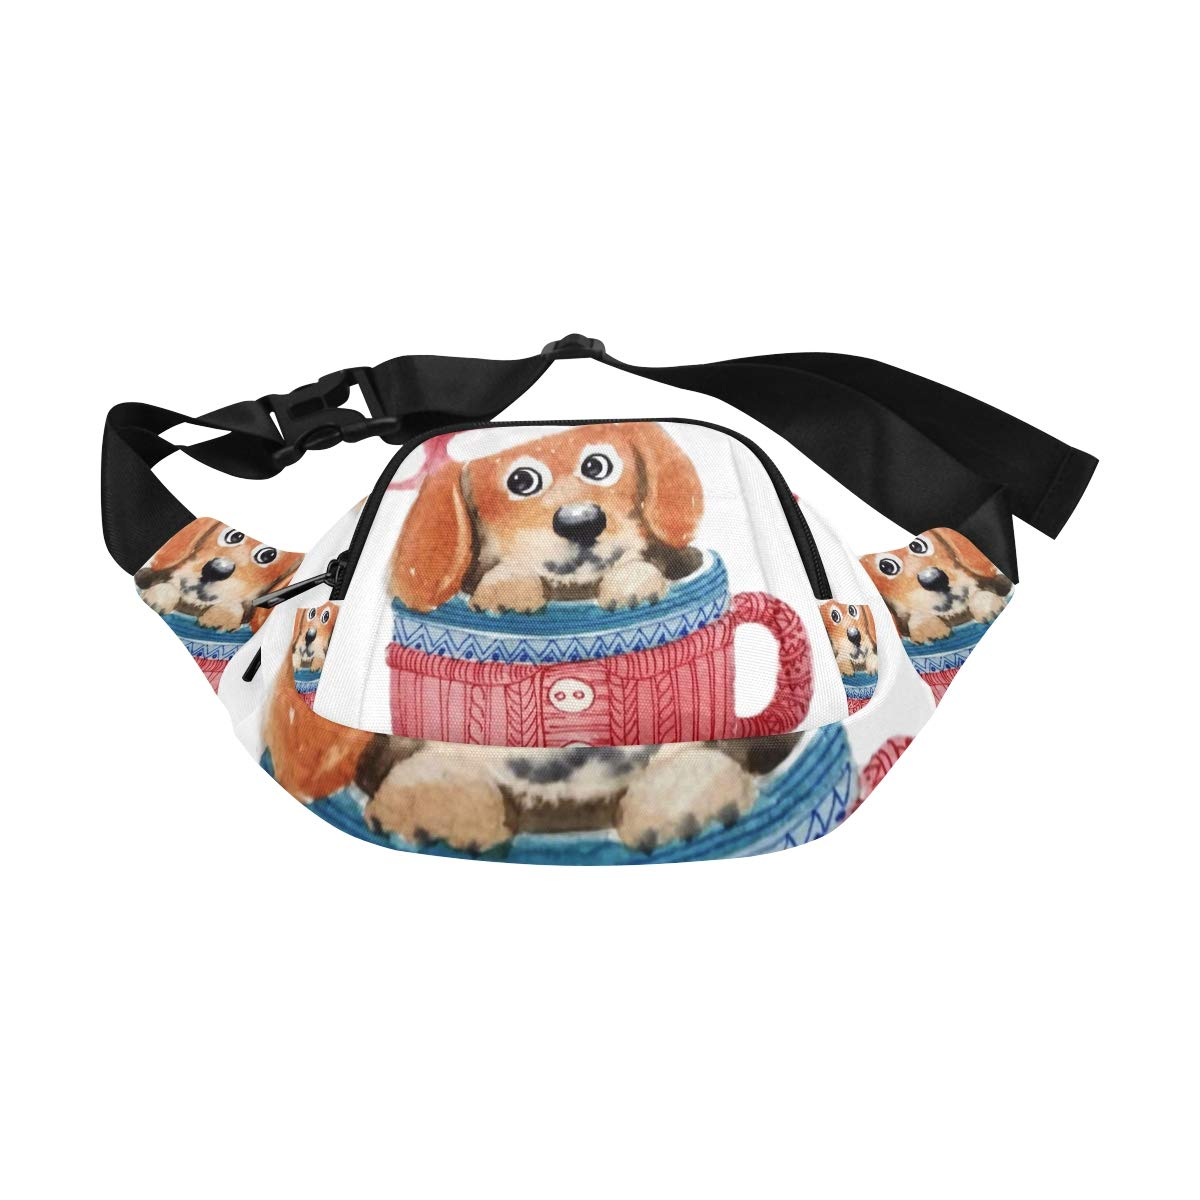 Cute Little Puppy Sit In A Cap Fenny Packs Waist Bags Adjustable Belt Waterproof Nylon Travel Running Sport Vacation Party For Men Women Boys Girls Kids